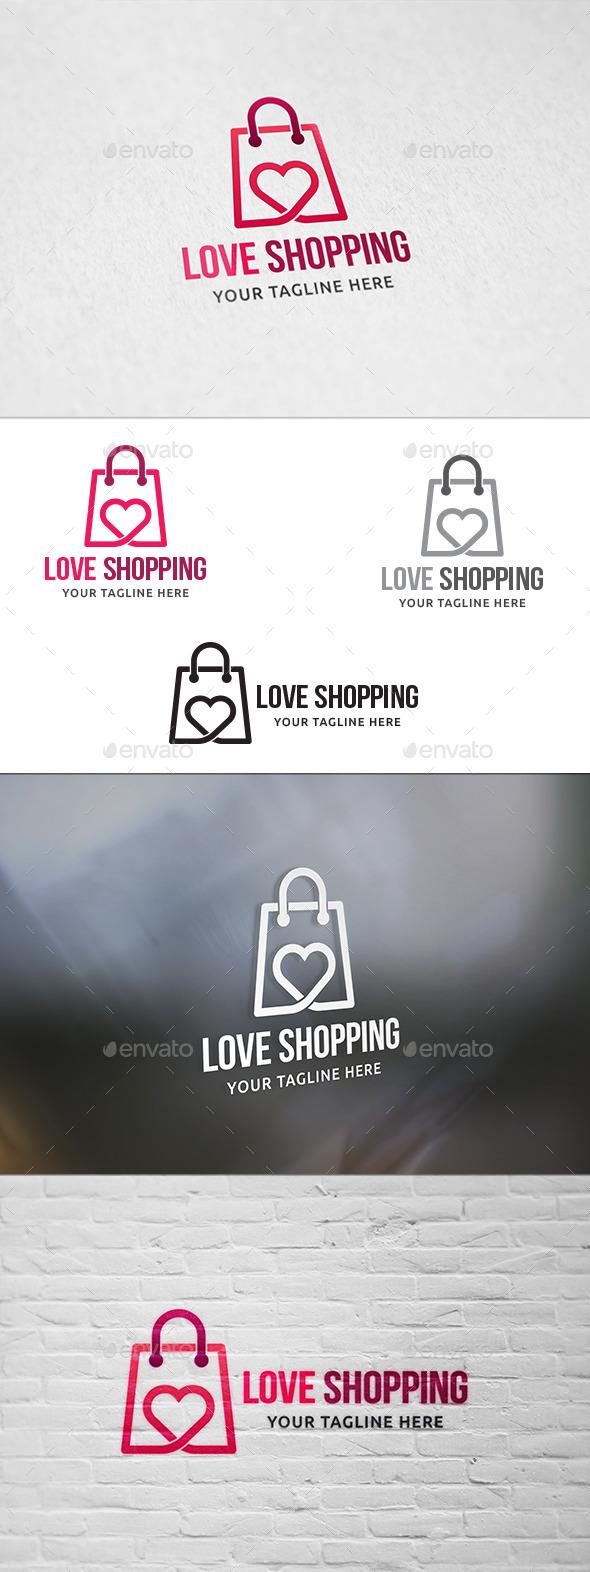 Love Shopping - Logo Template